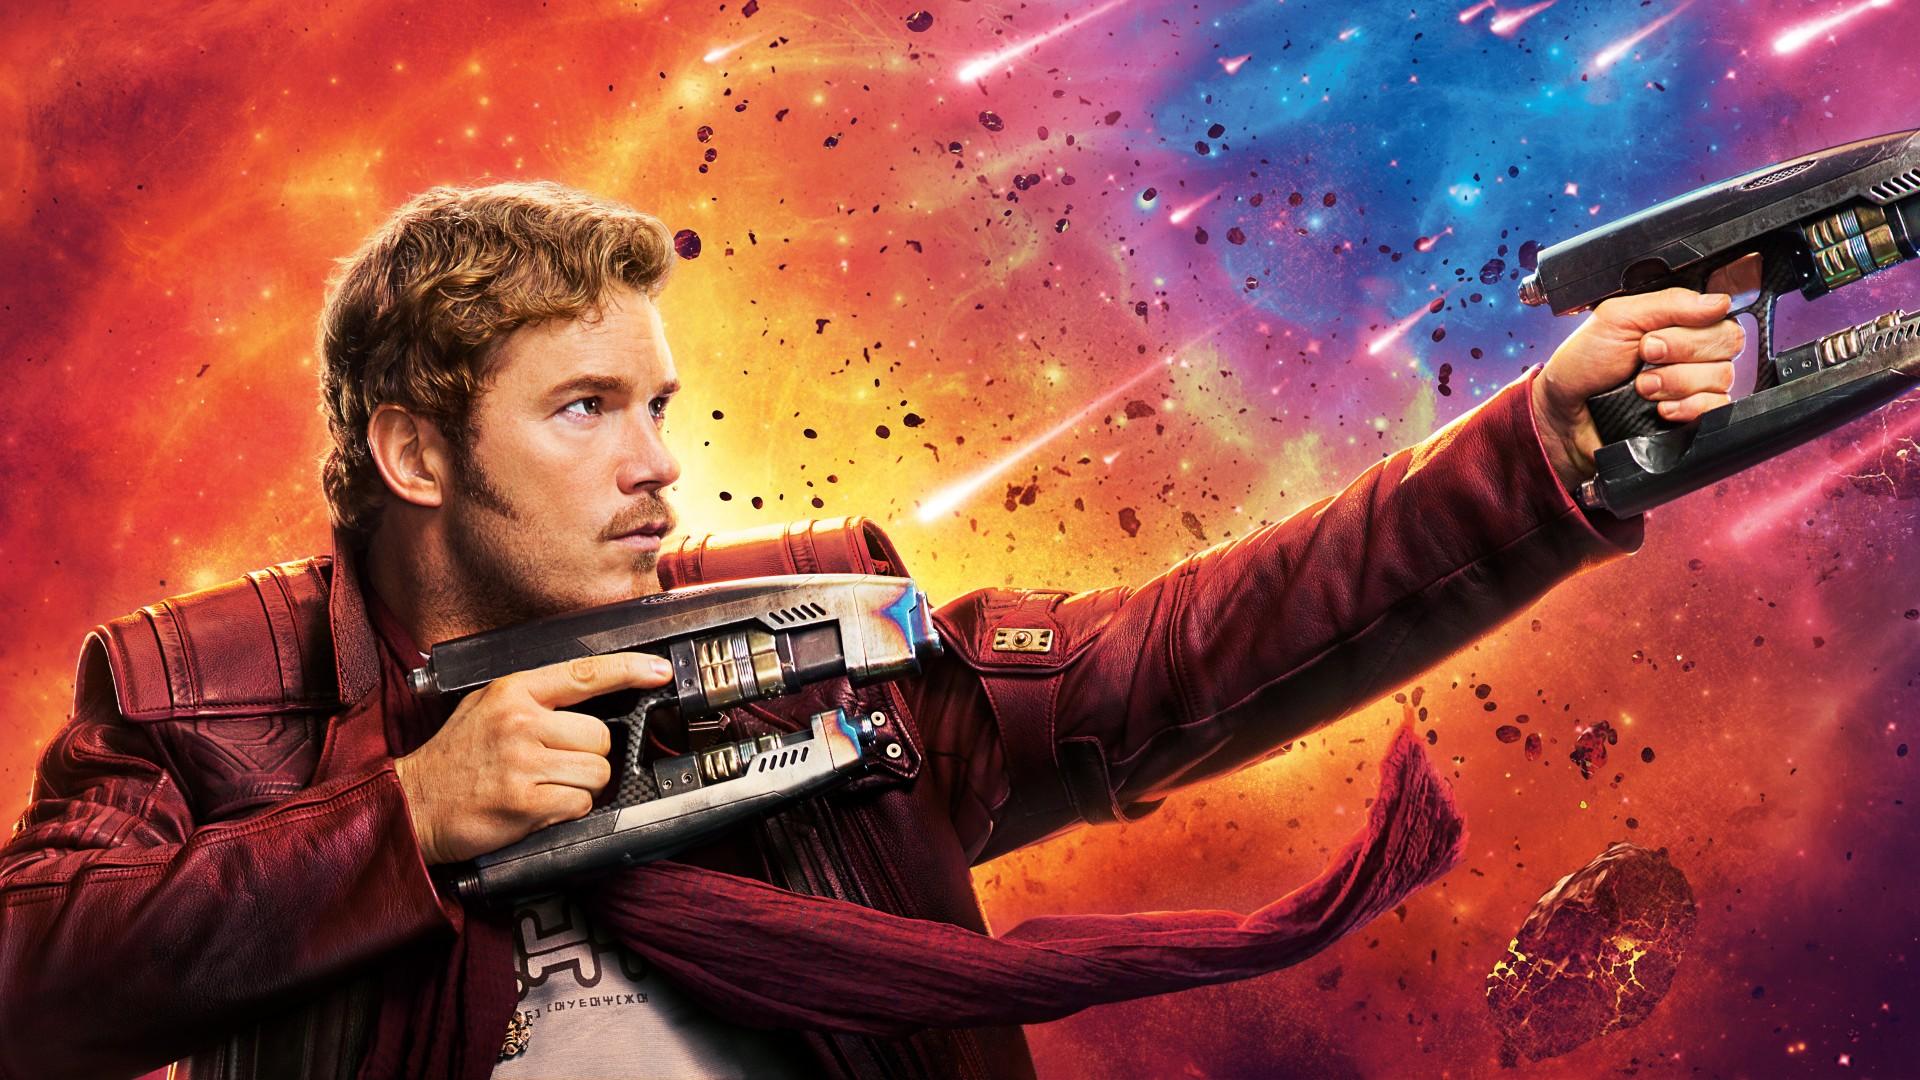 Wallpaper Wide Girl Chris Pratt Star Lord Guardians Of The Galaxy Vol 2 4k 8k